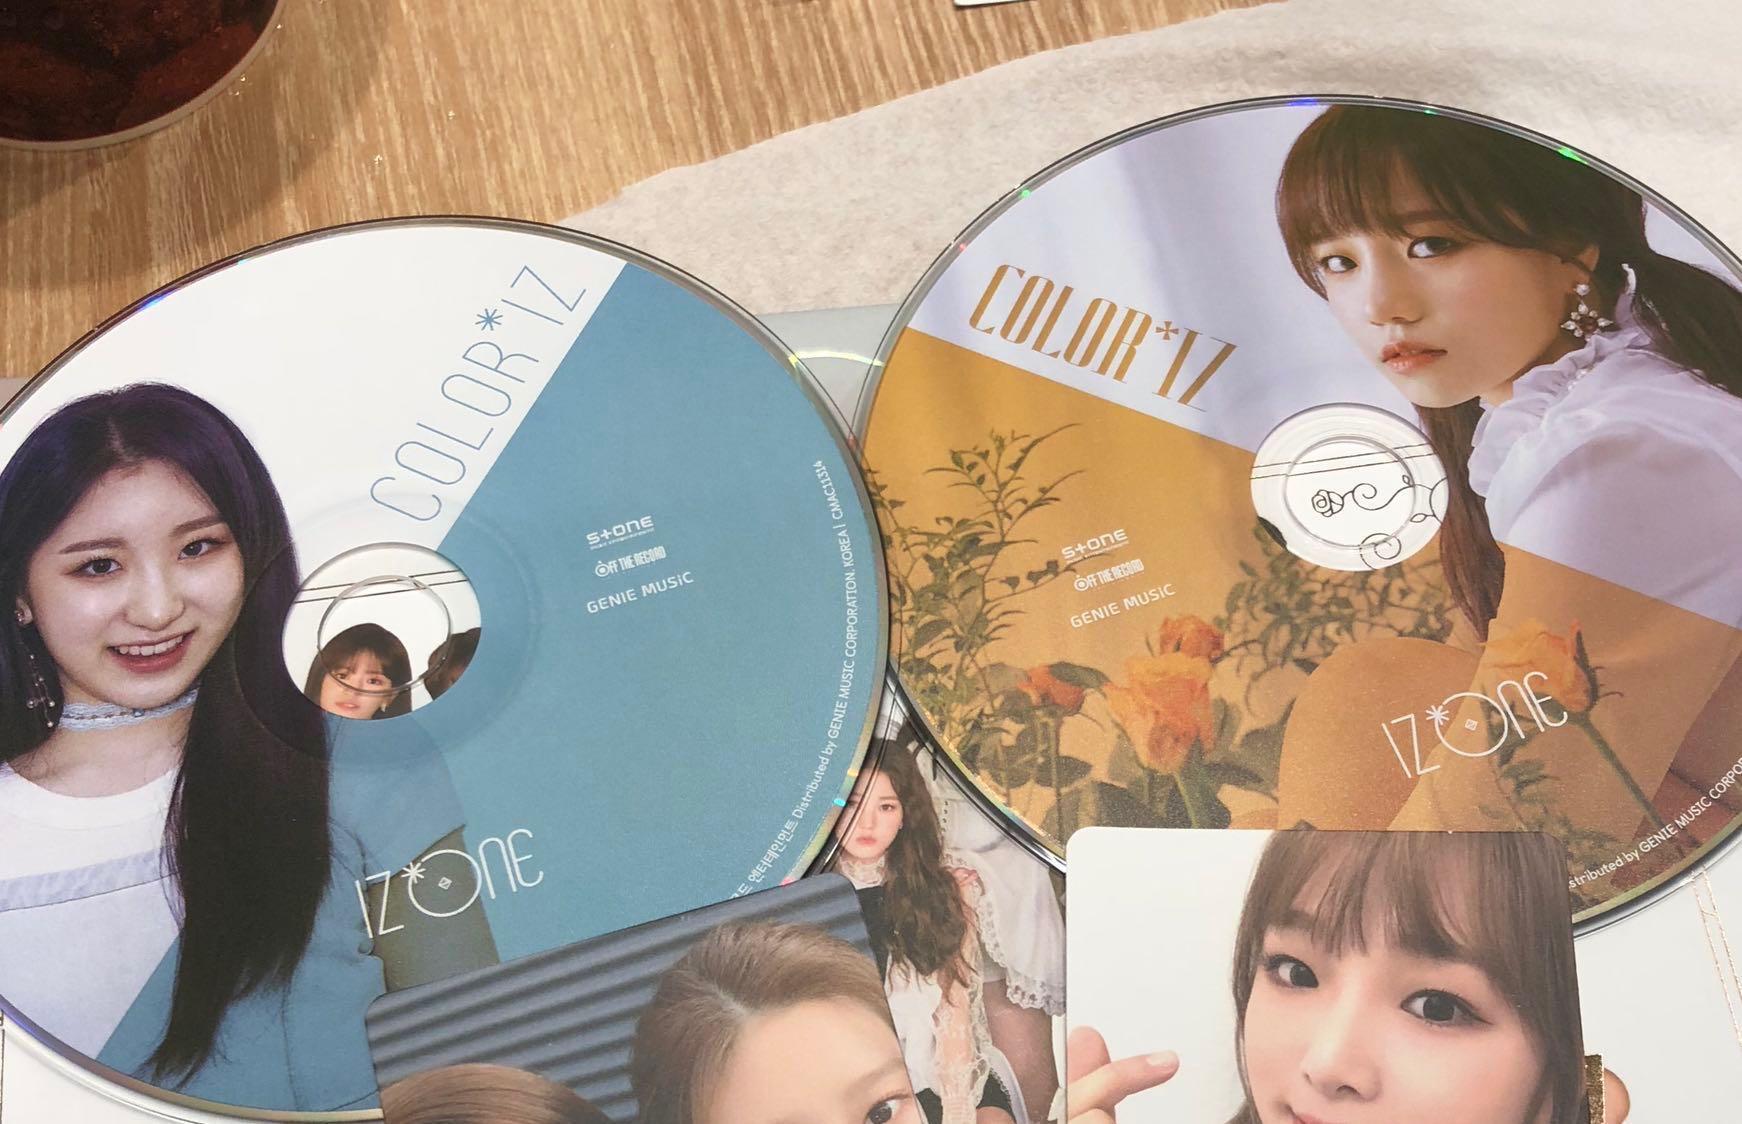 WTT IZONE CDs